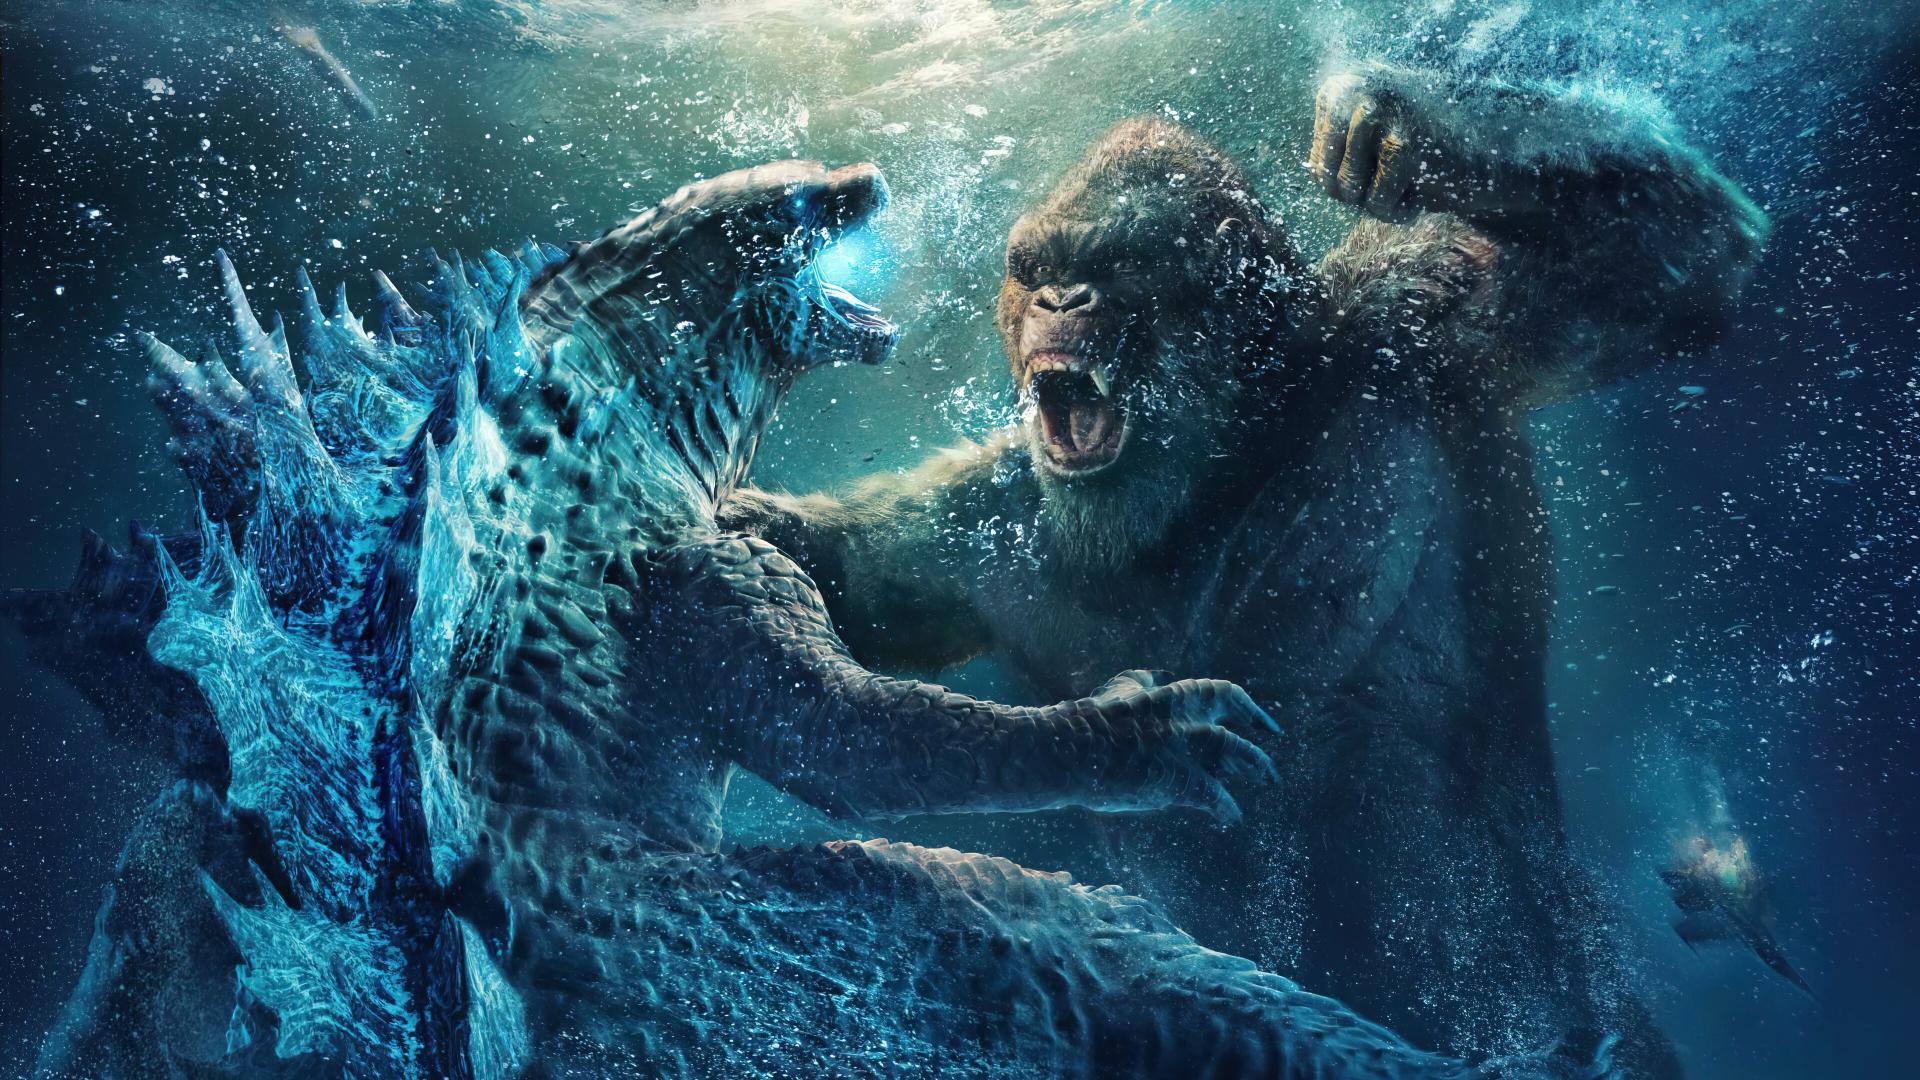 Godzilla Kong ellen - Godzilla vs. Kong (2021)